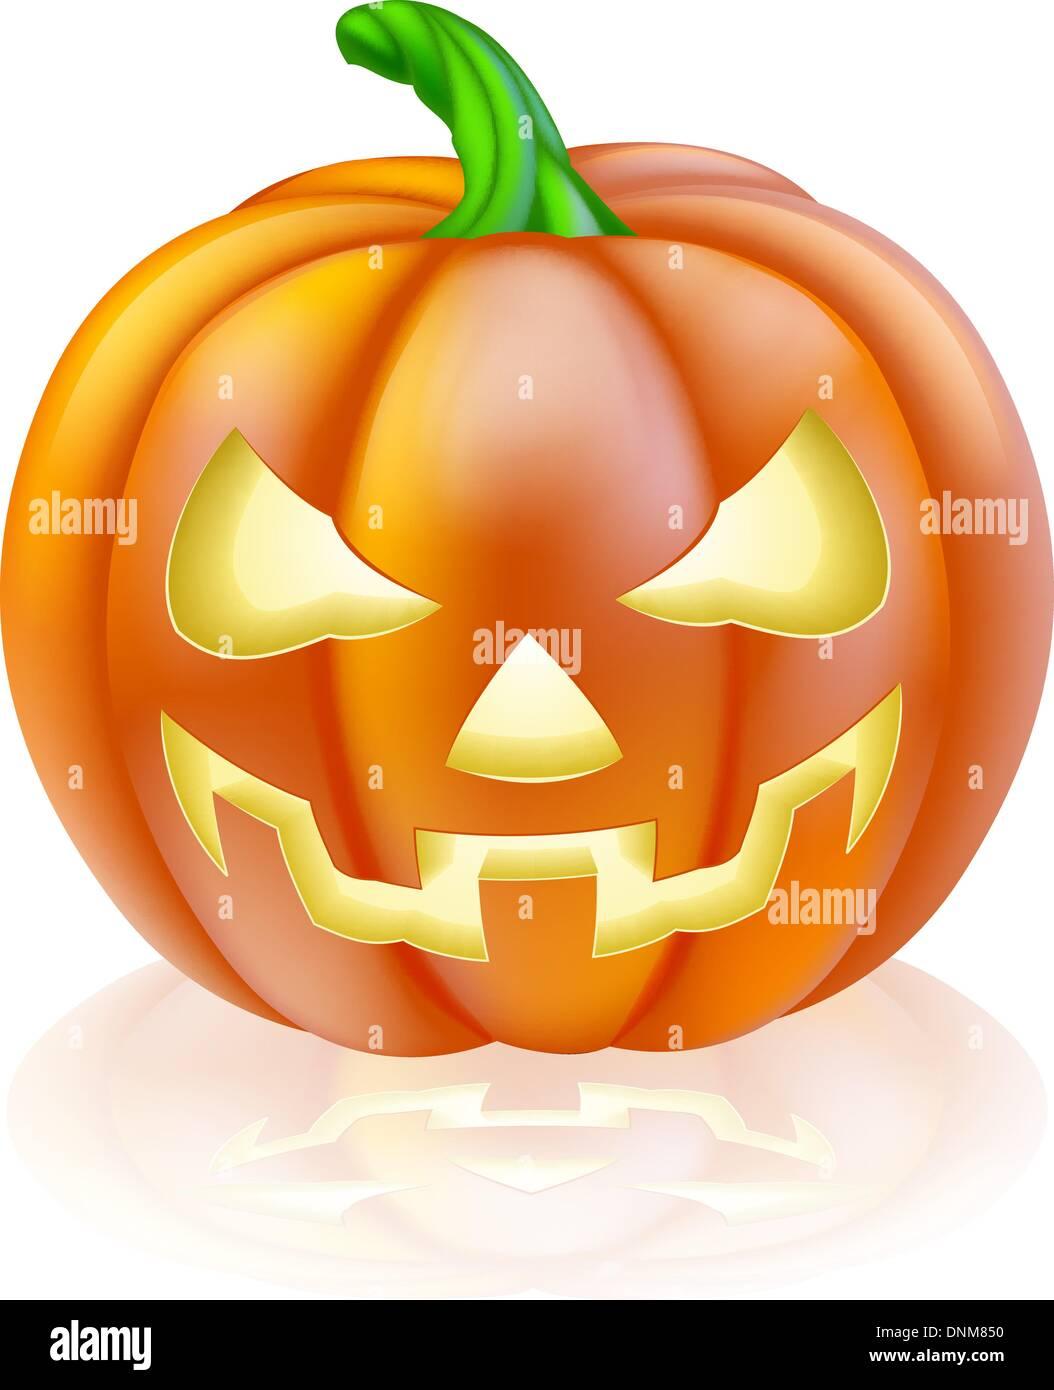 Halloween Pumpkin Drawing.A Drawing Of A Cartoon Halloween Pumpkin With Classic Scary